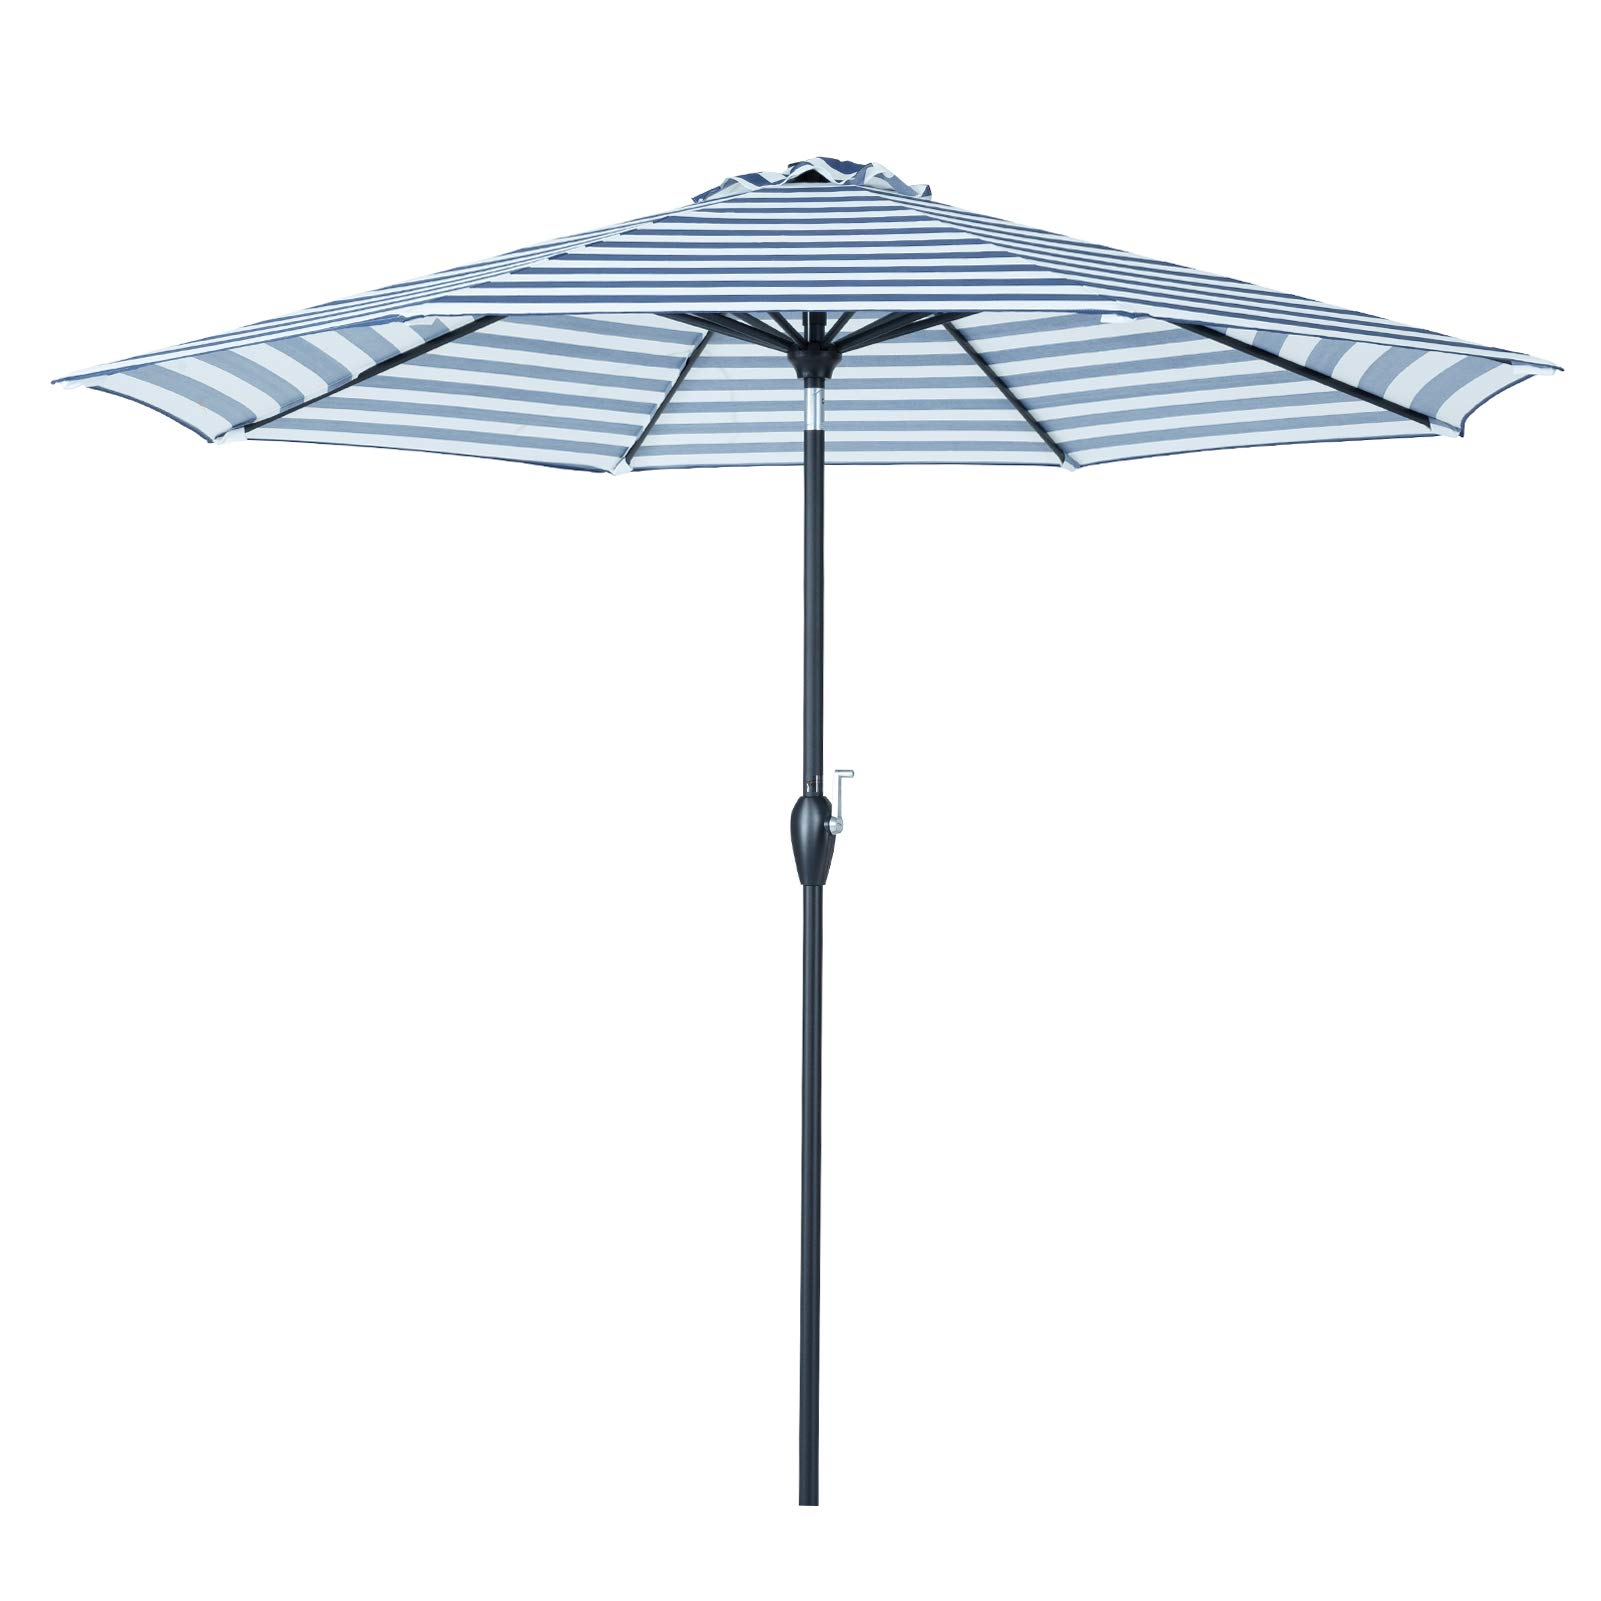 Tempera 9 ft Auto-Tilt Patio Umbrella Outdoor Market Umbrella, 8 Steel Ribs, Blue White Stripe